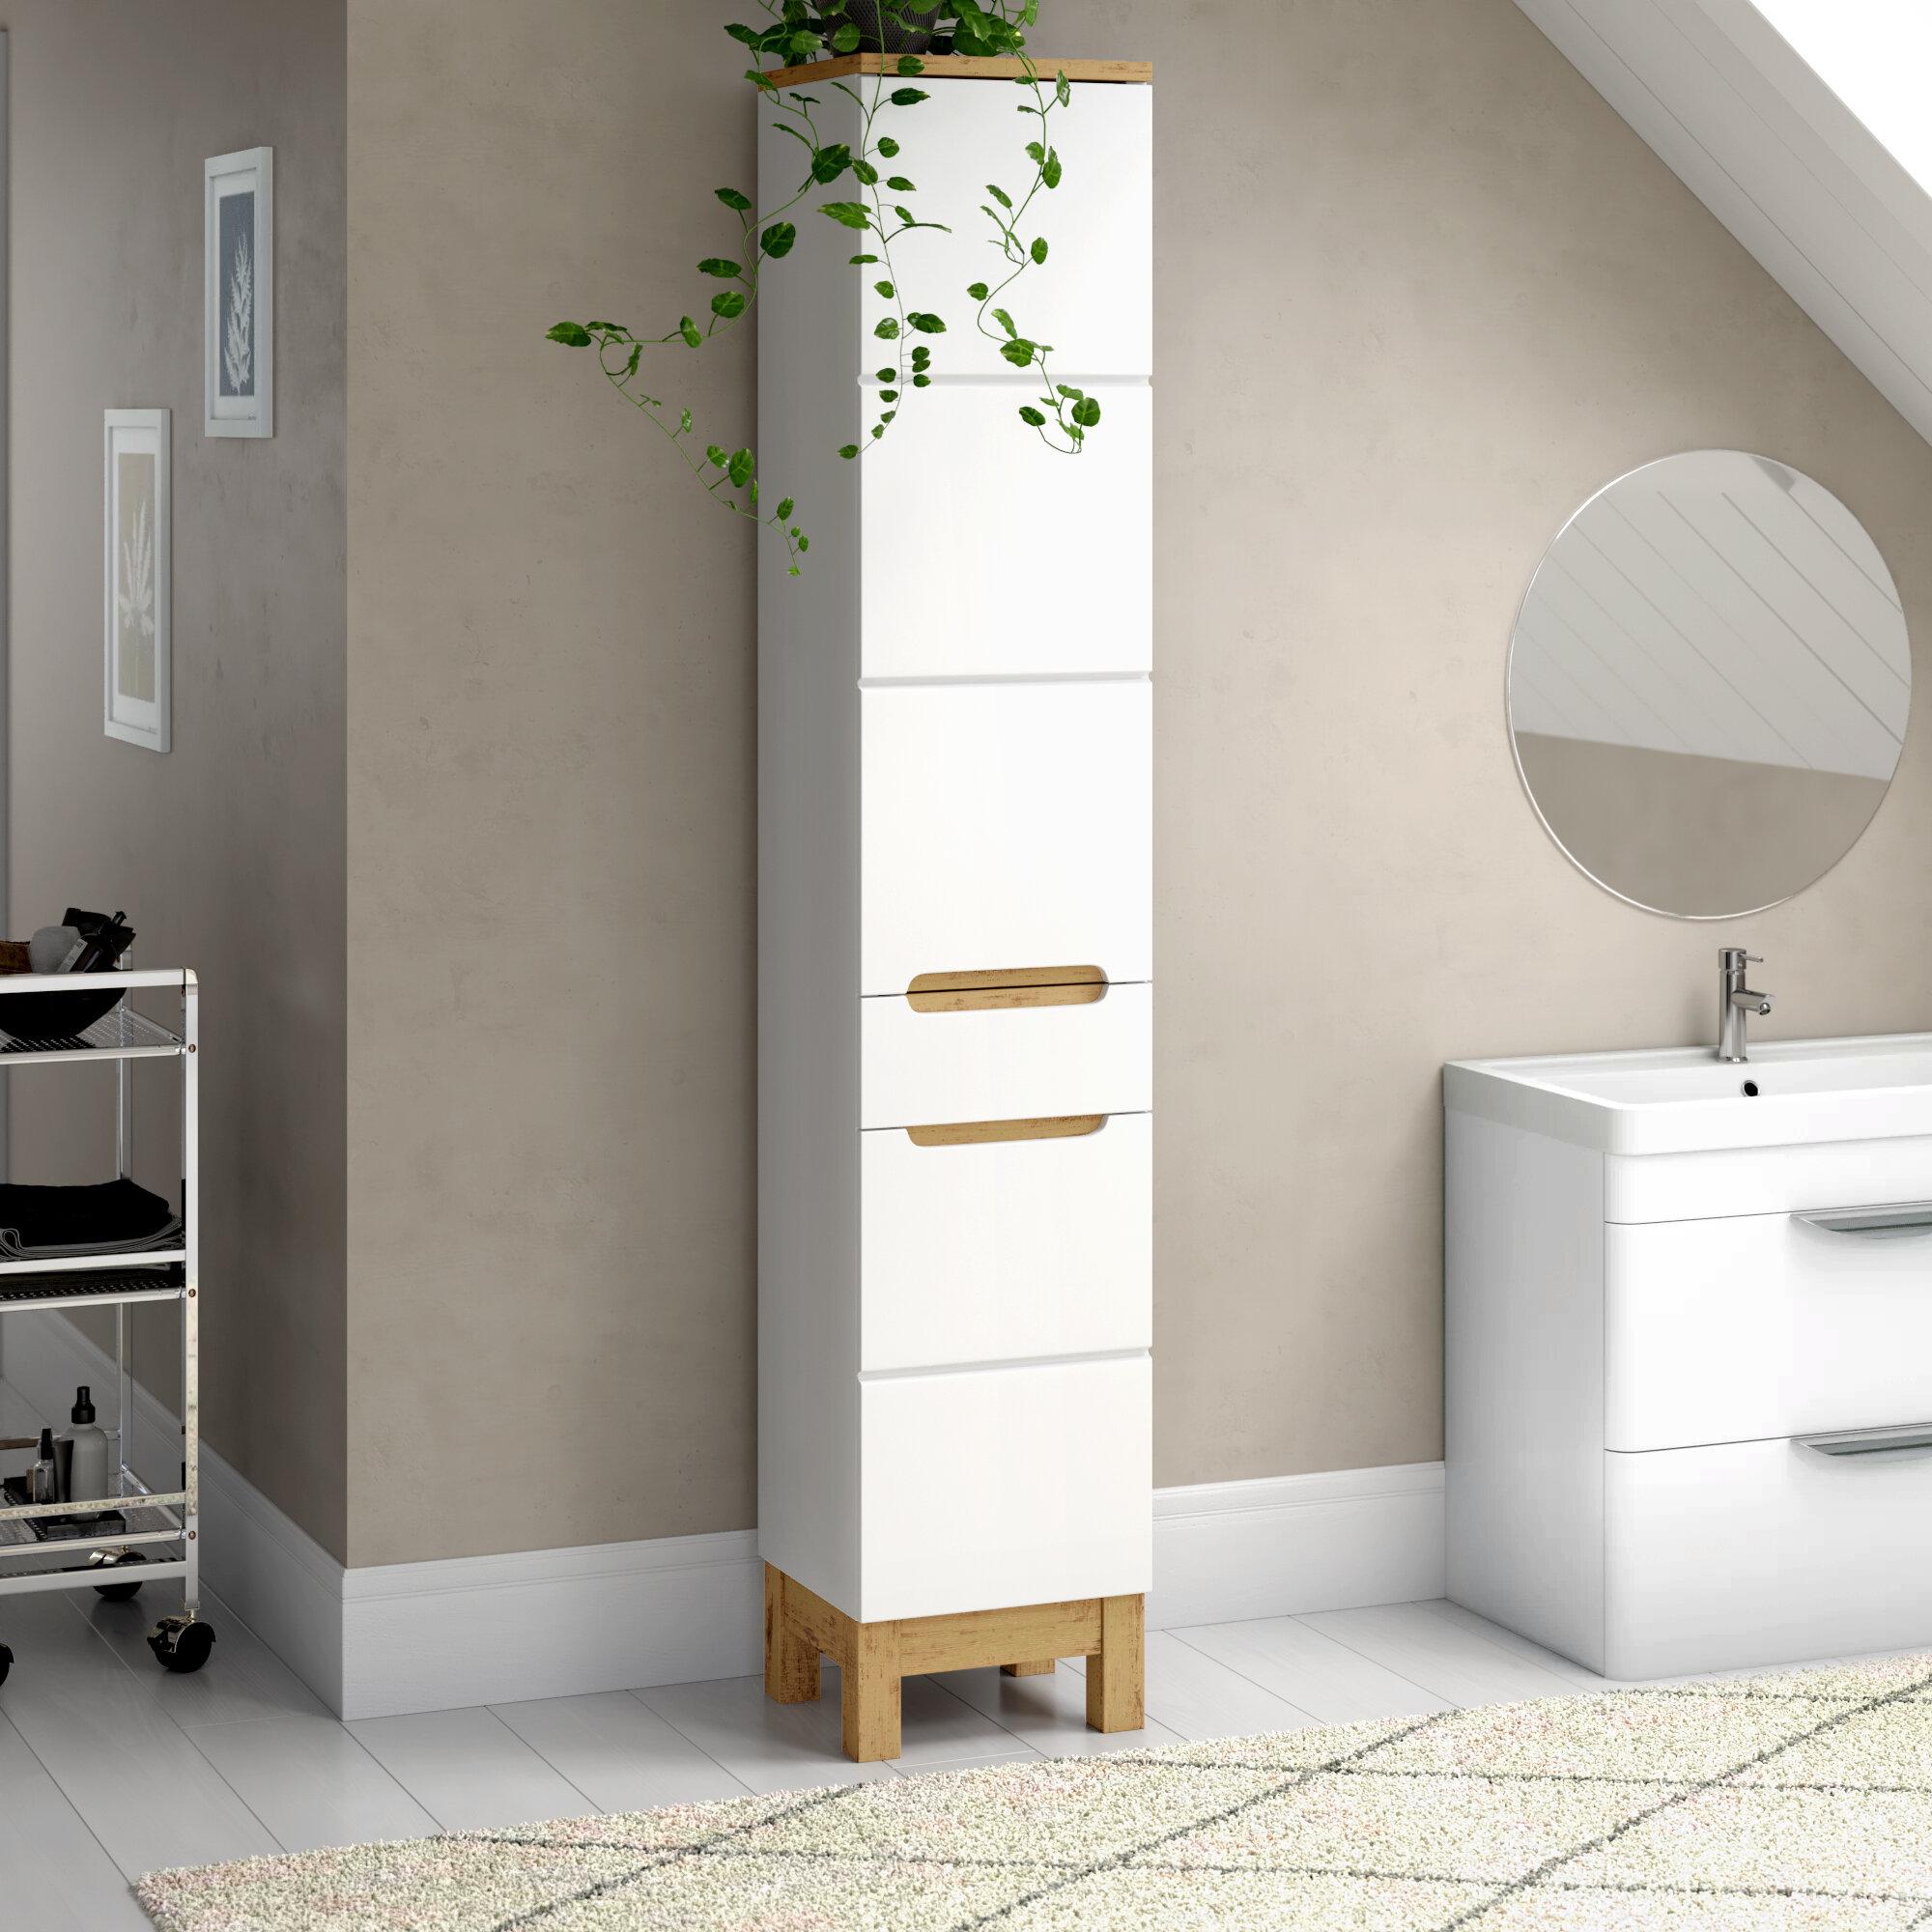 Bali Bathroom Furniture Faucet Ideas Site